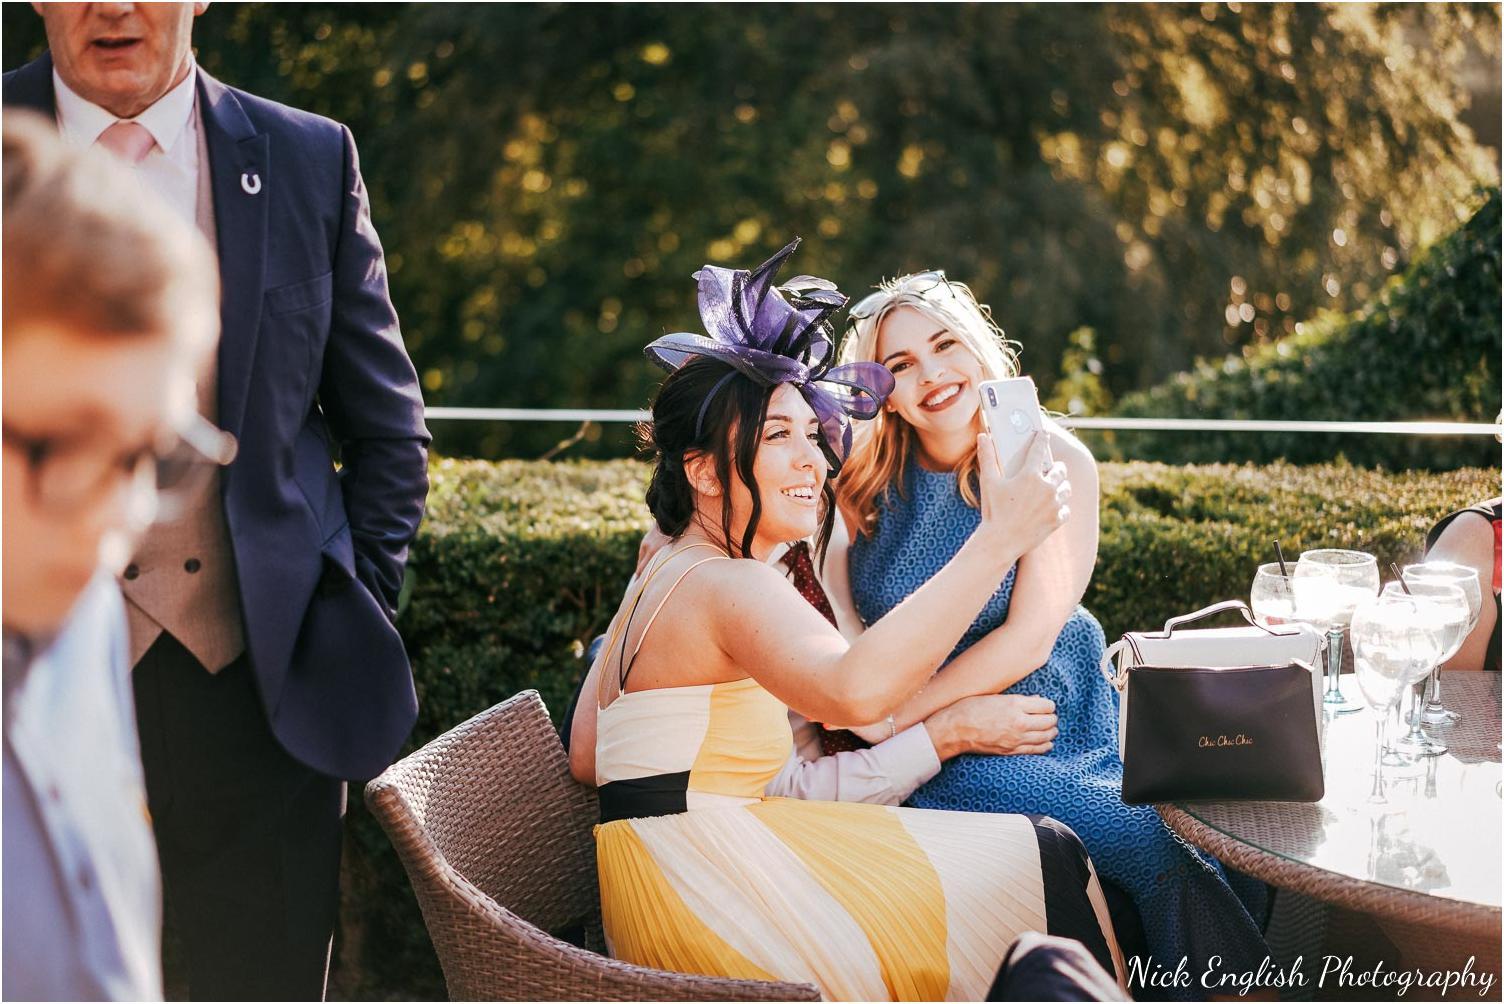 Mitton_Hall_Wedding_Photograph-179.jpg